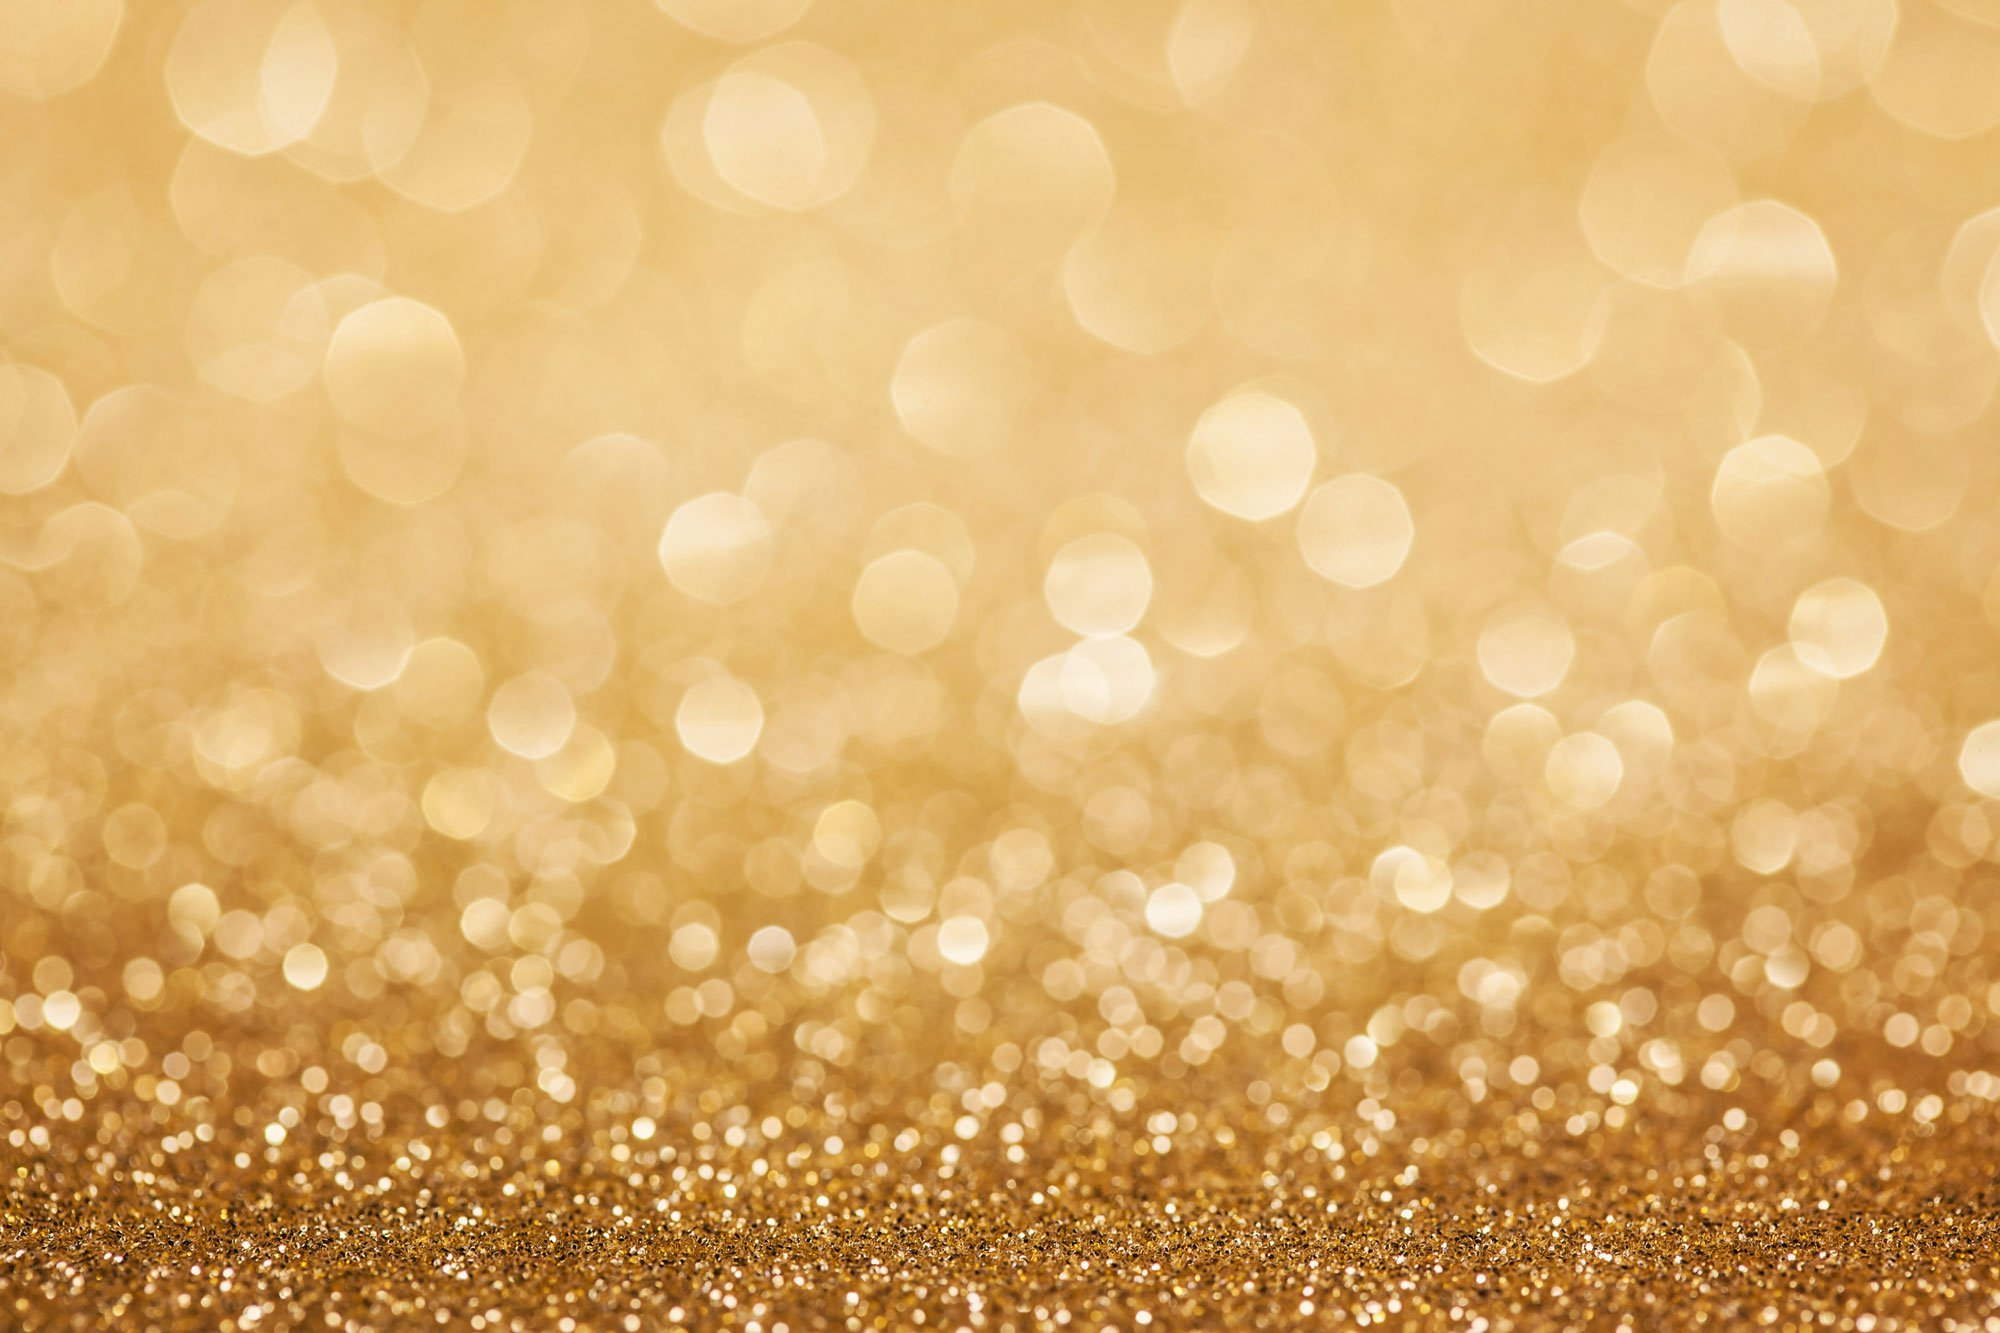 Images Of Glitter Background - WallpaperSafari